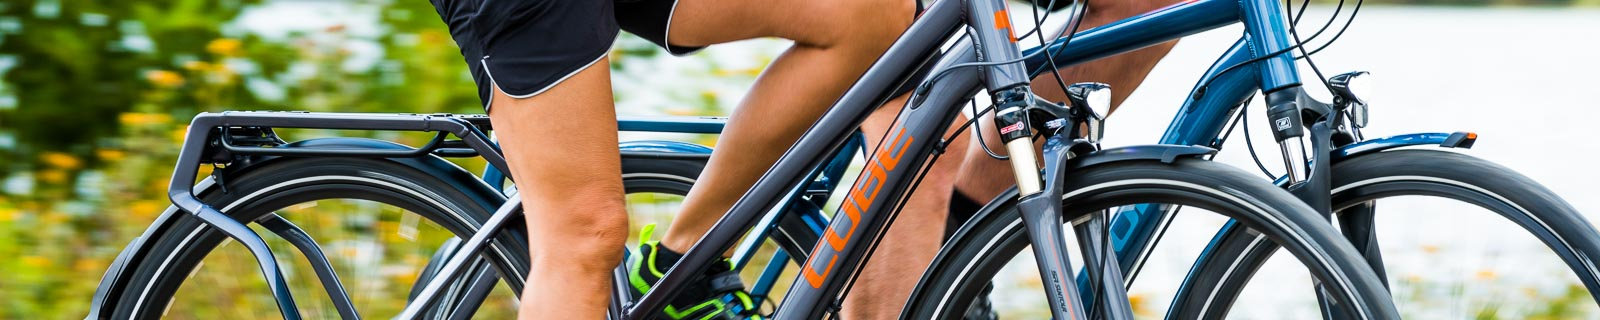 Bicicletas Trekking para damas